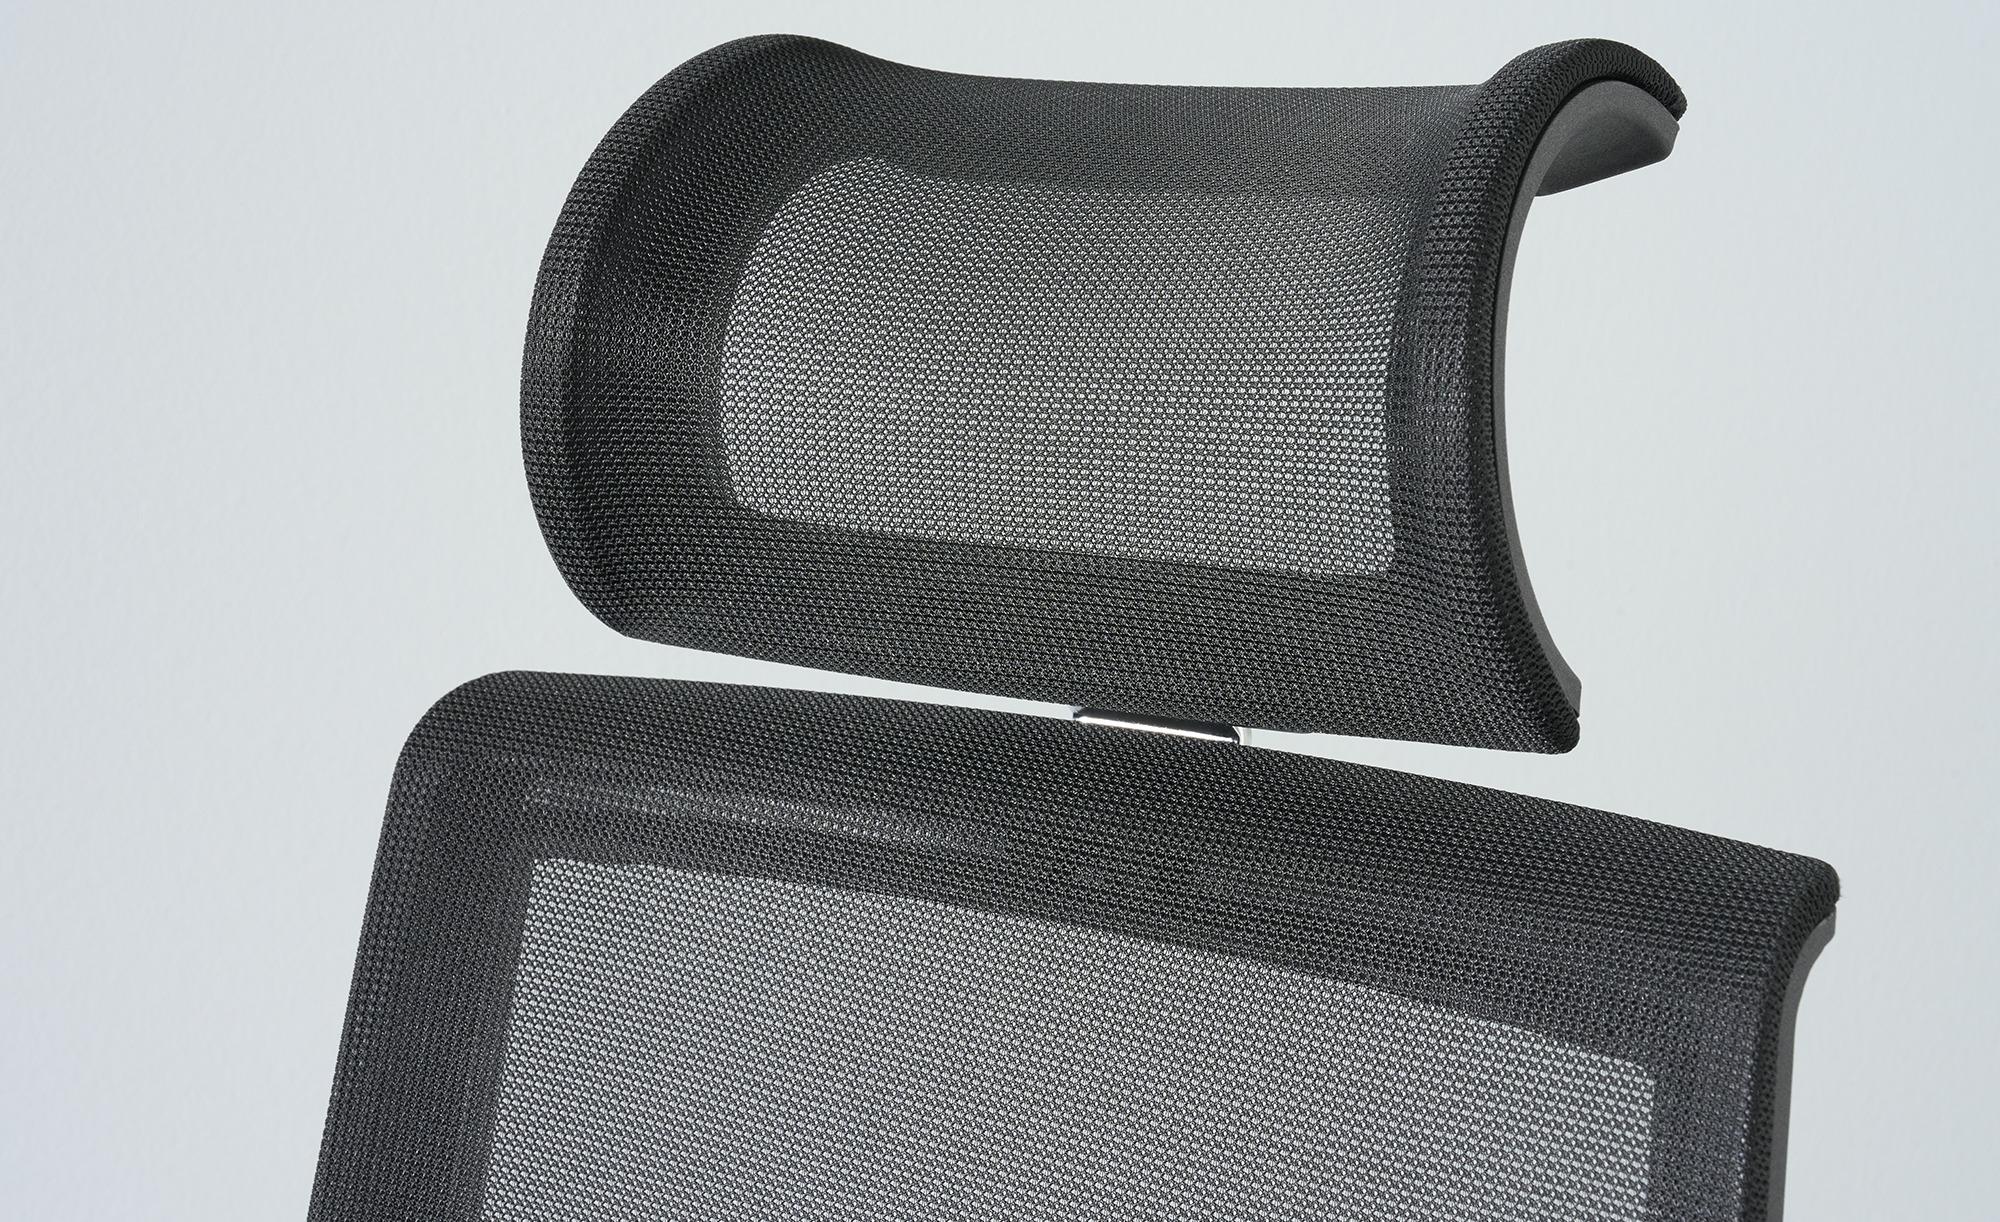 Bürodrehstuhl   Zenn ¦ schwarz Stühle > Bürostühle > Drehstühle - Höffner